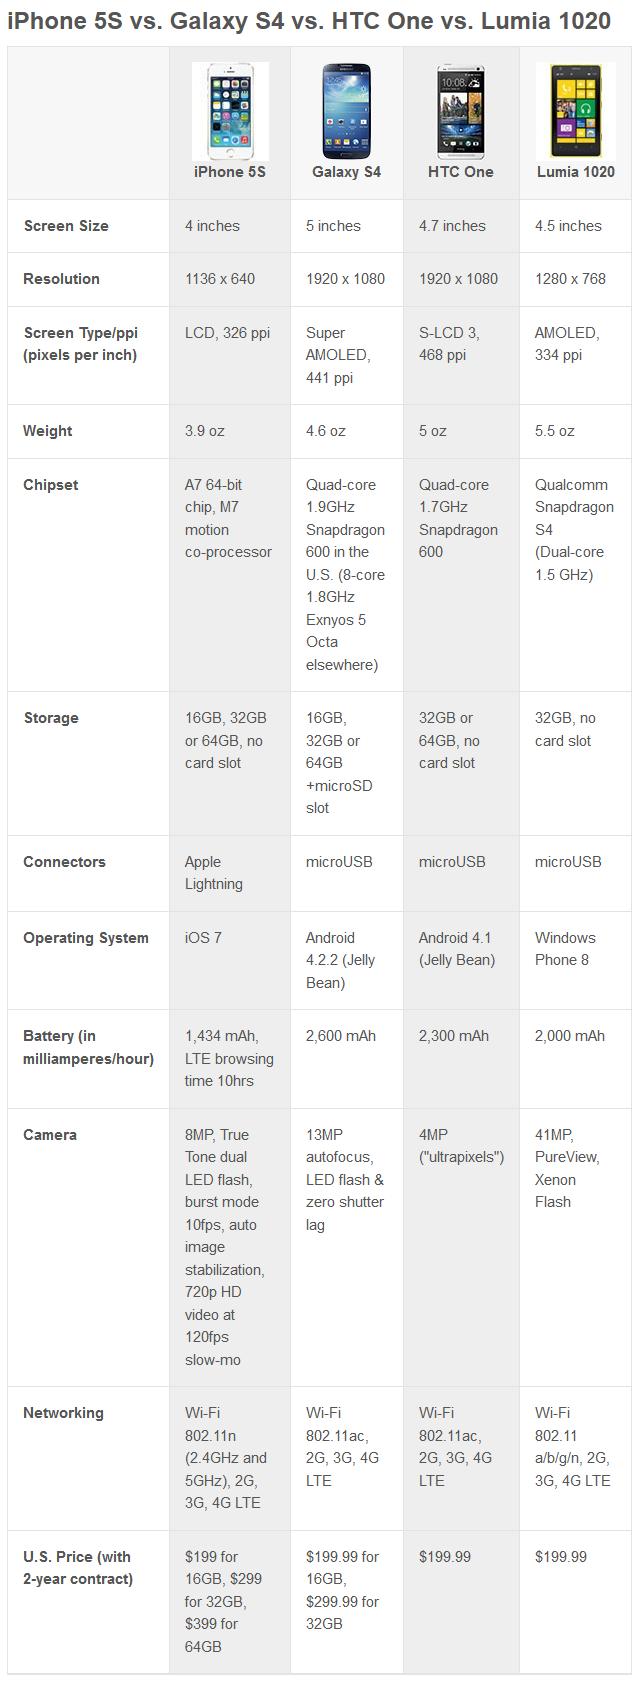 tableau-comparatif-iphone-samsung-htc-lumia